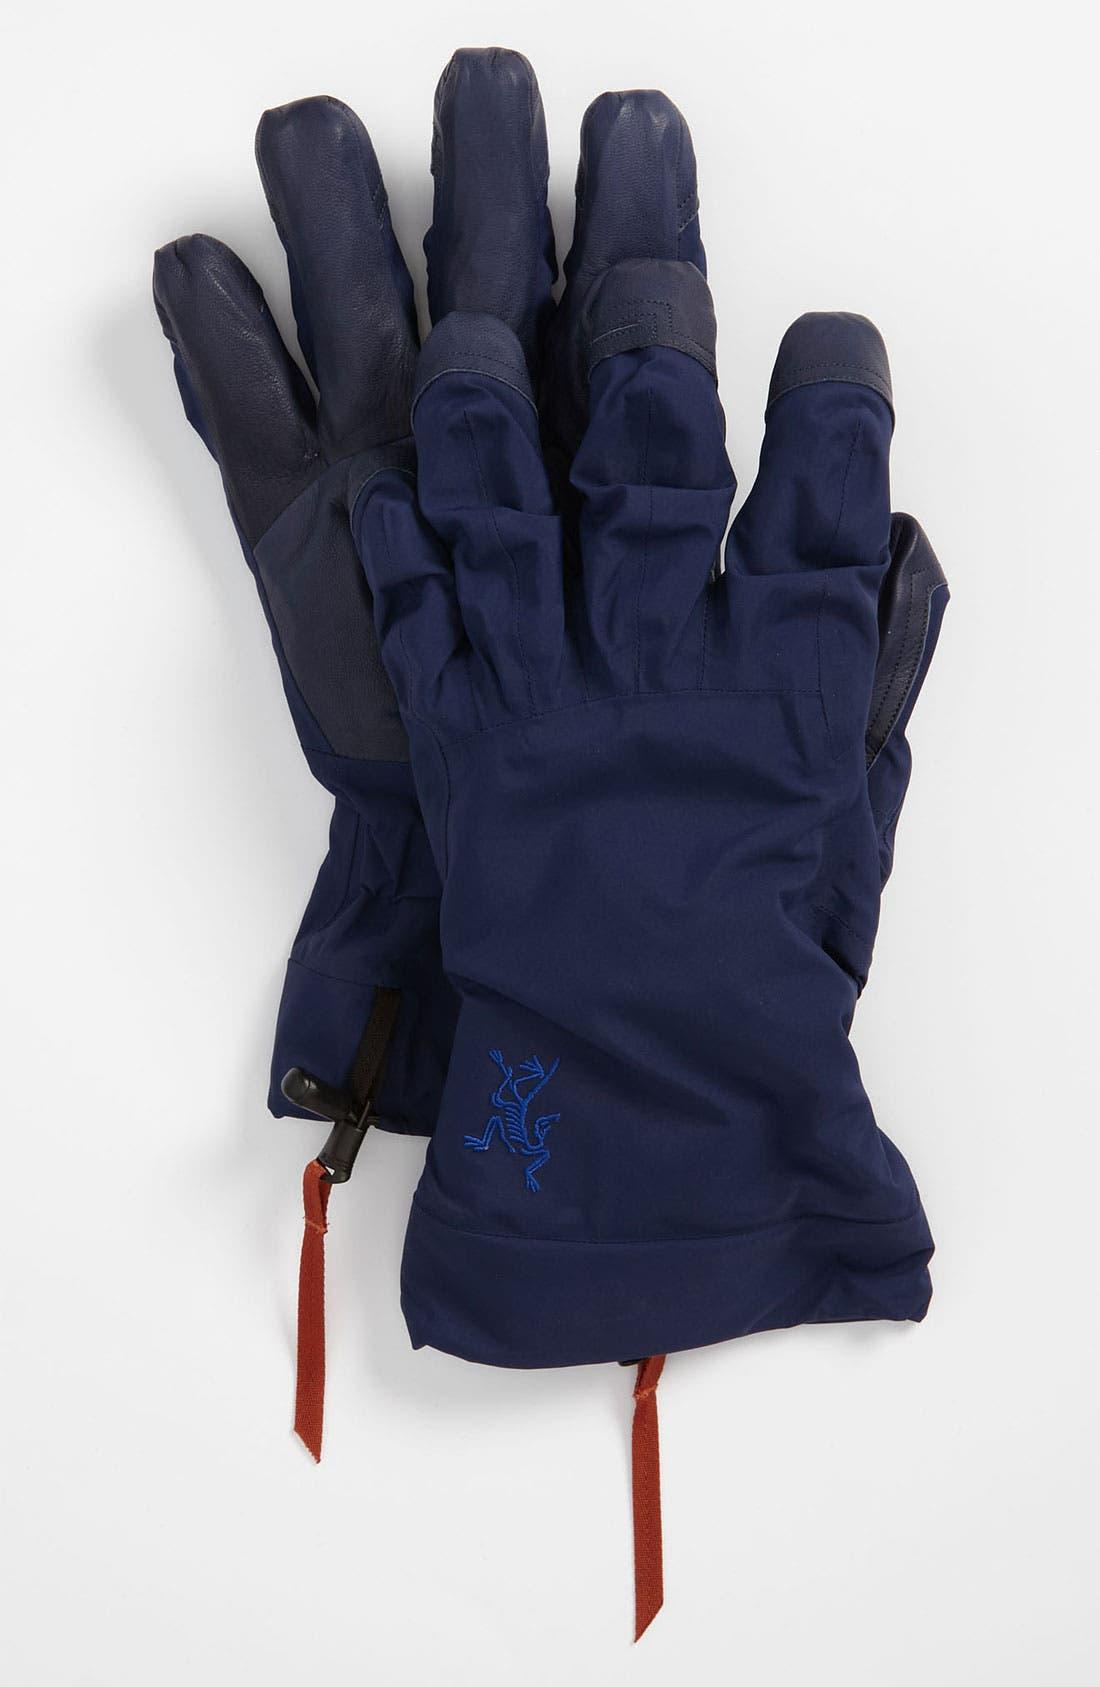 Main Image - Arc'teryx 'Beta AR' Gloves